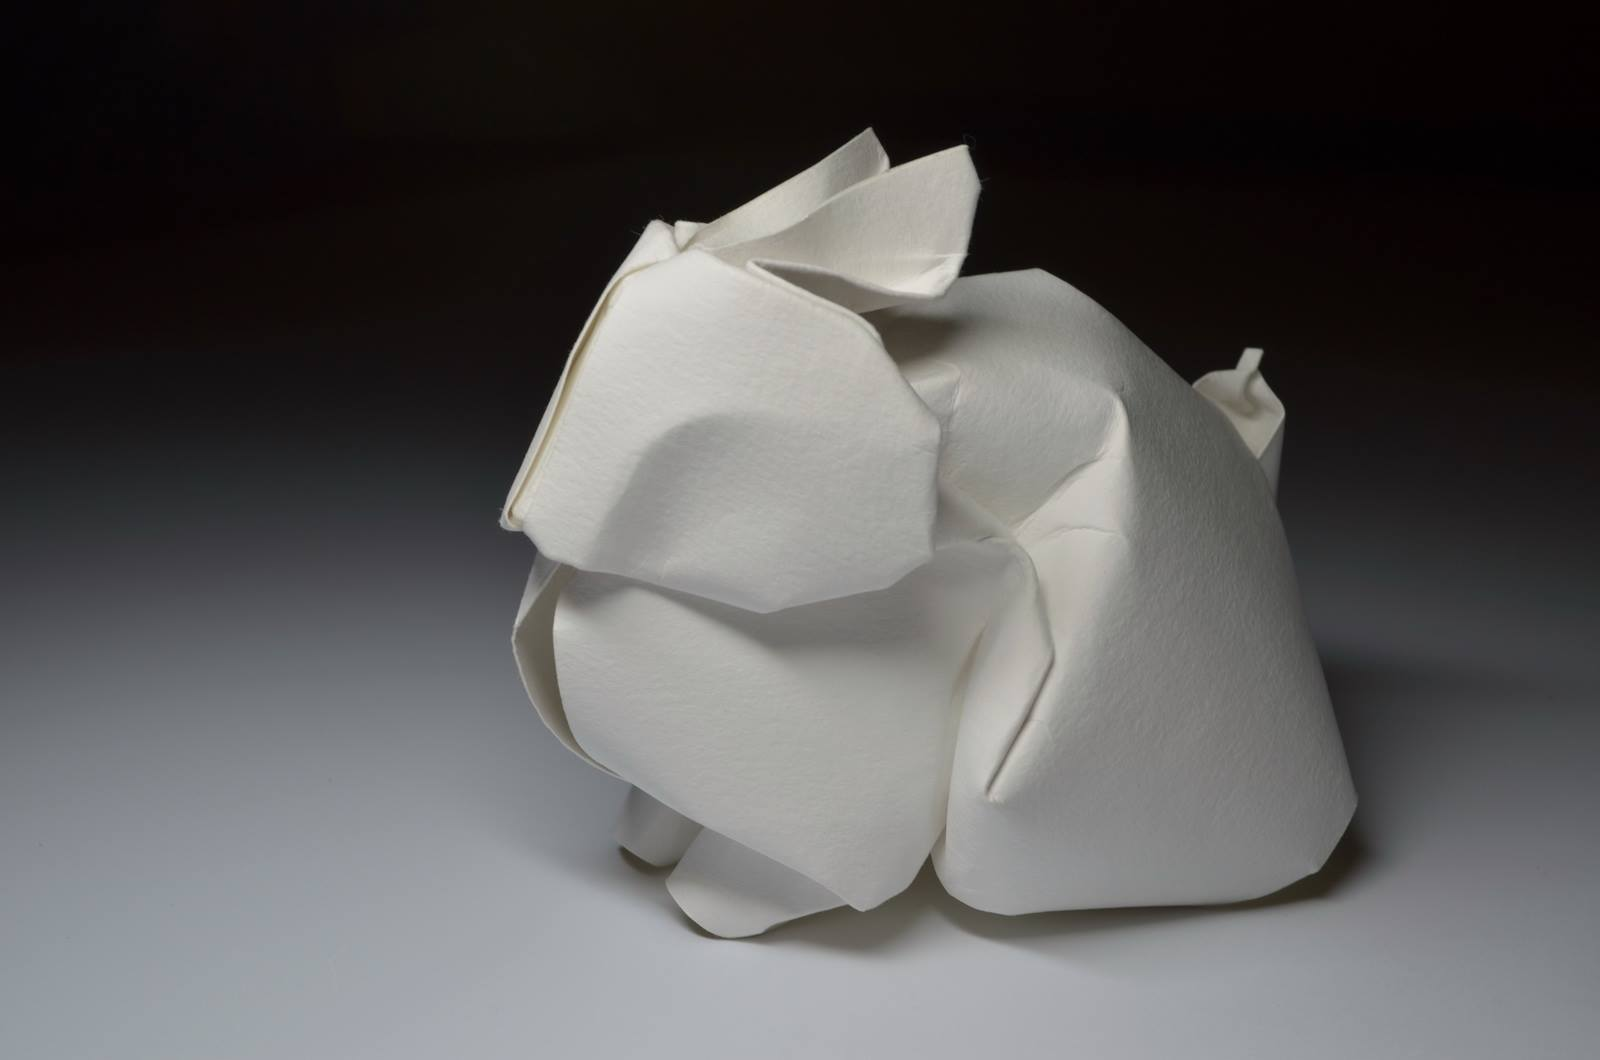 Hoàng Tiến Quyết Wet Fold Origami Rabbit